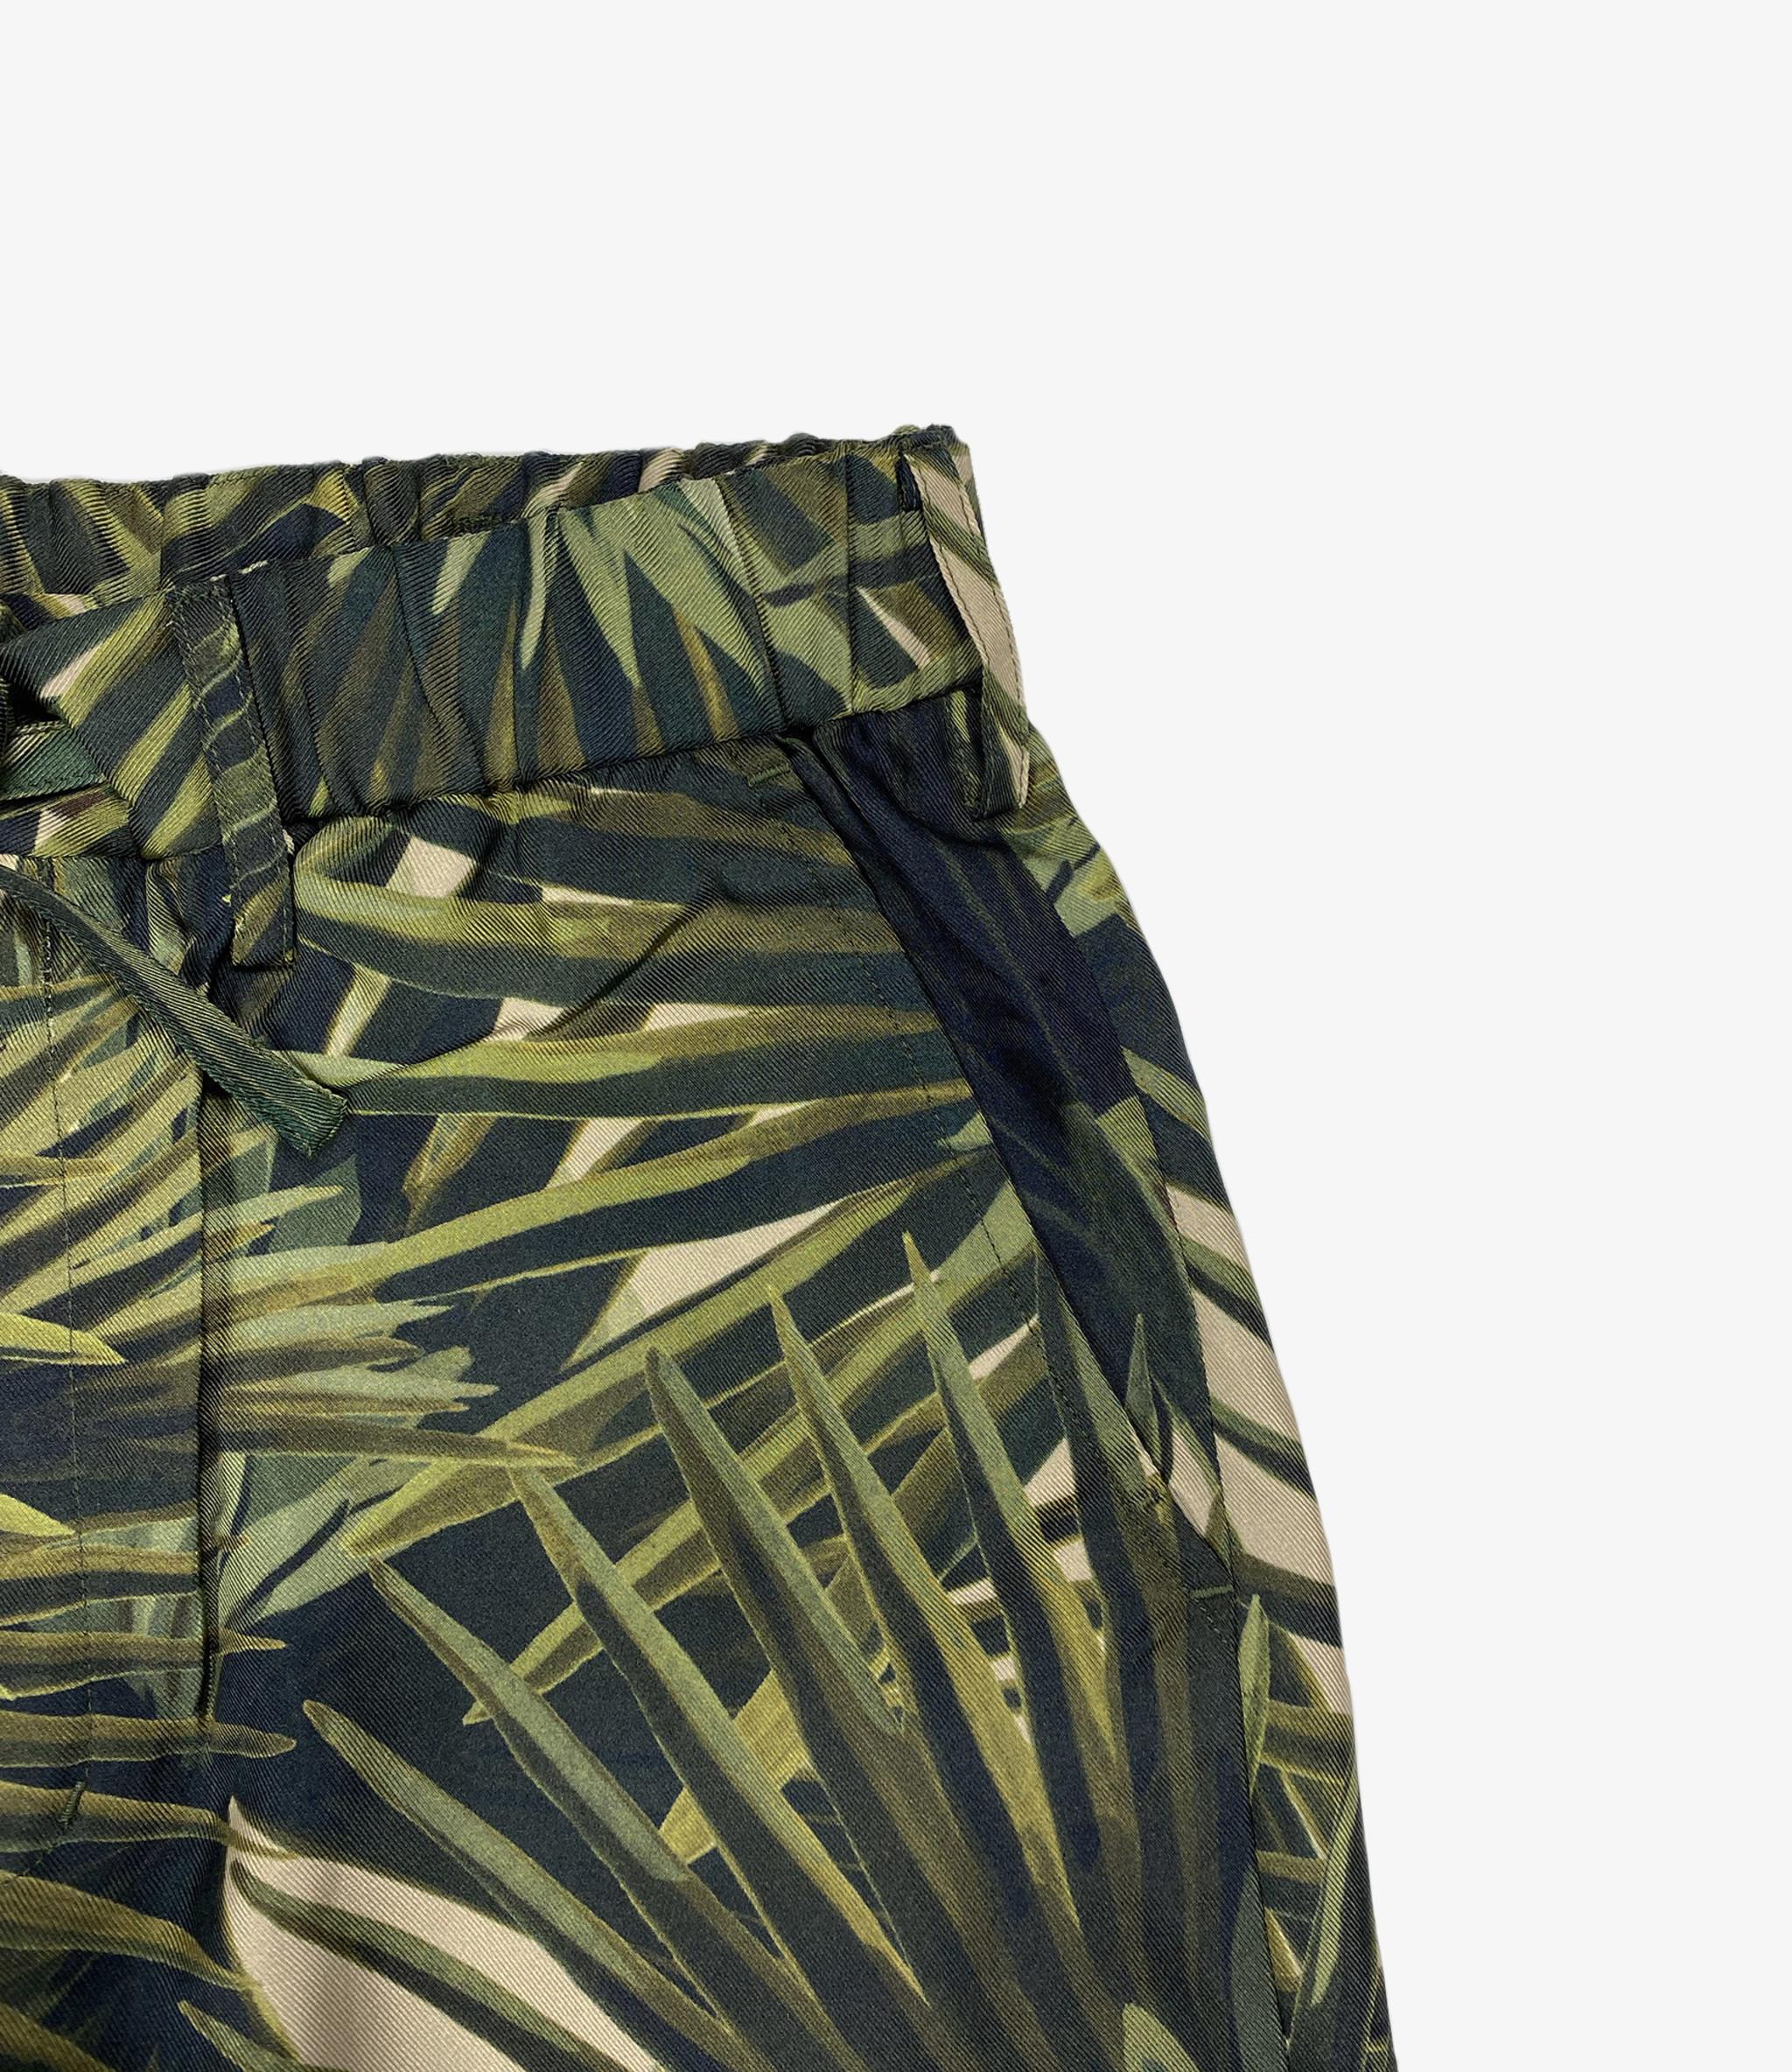 Wang Chomphu Silk String Short / Kang Keag Sant - Borassus Flabellifer